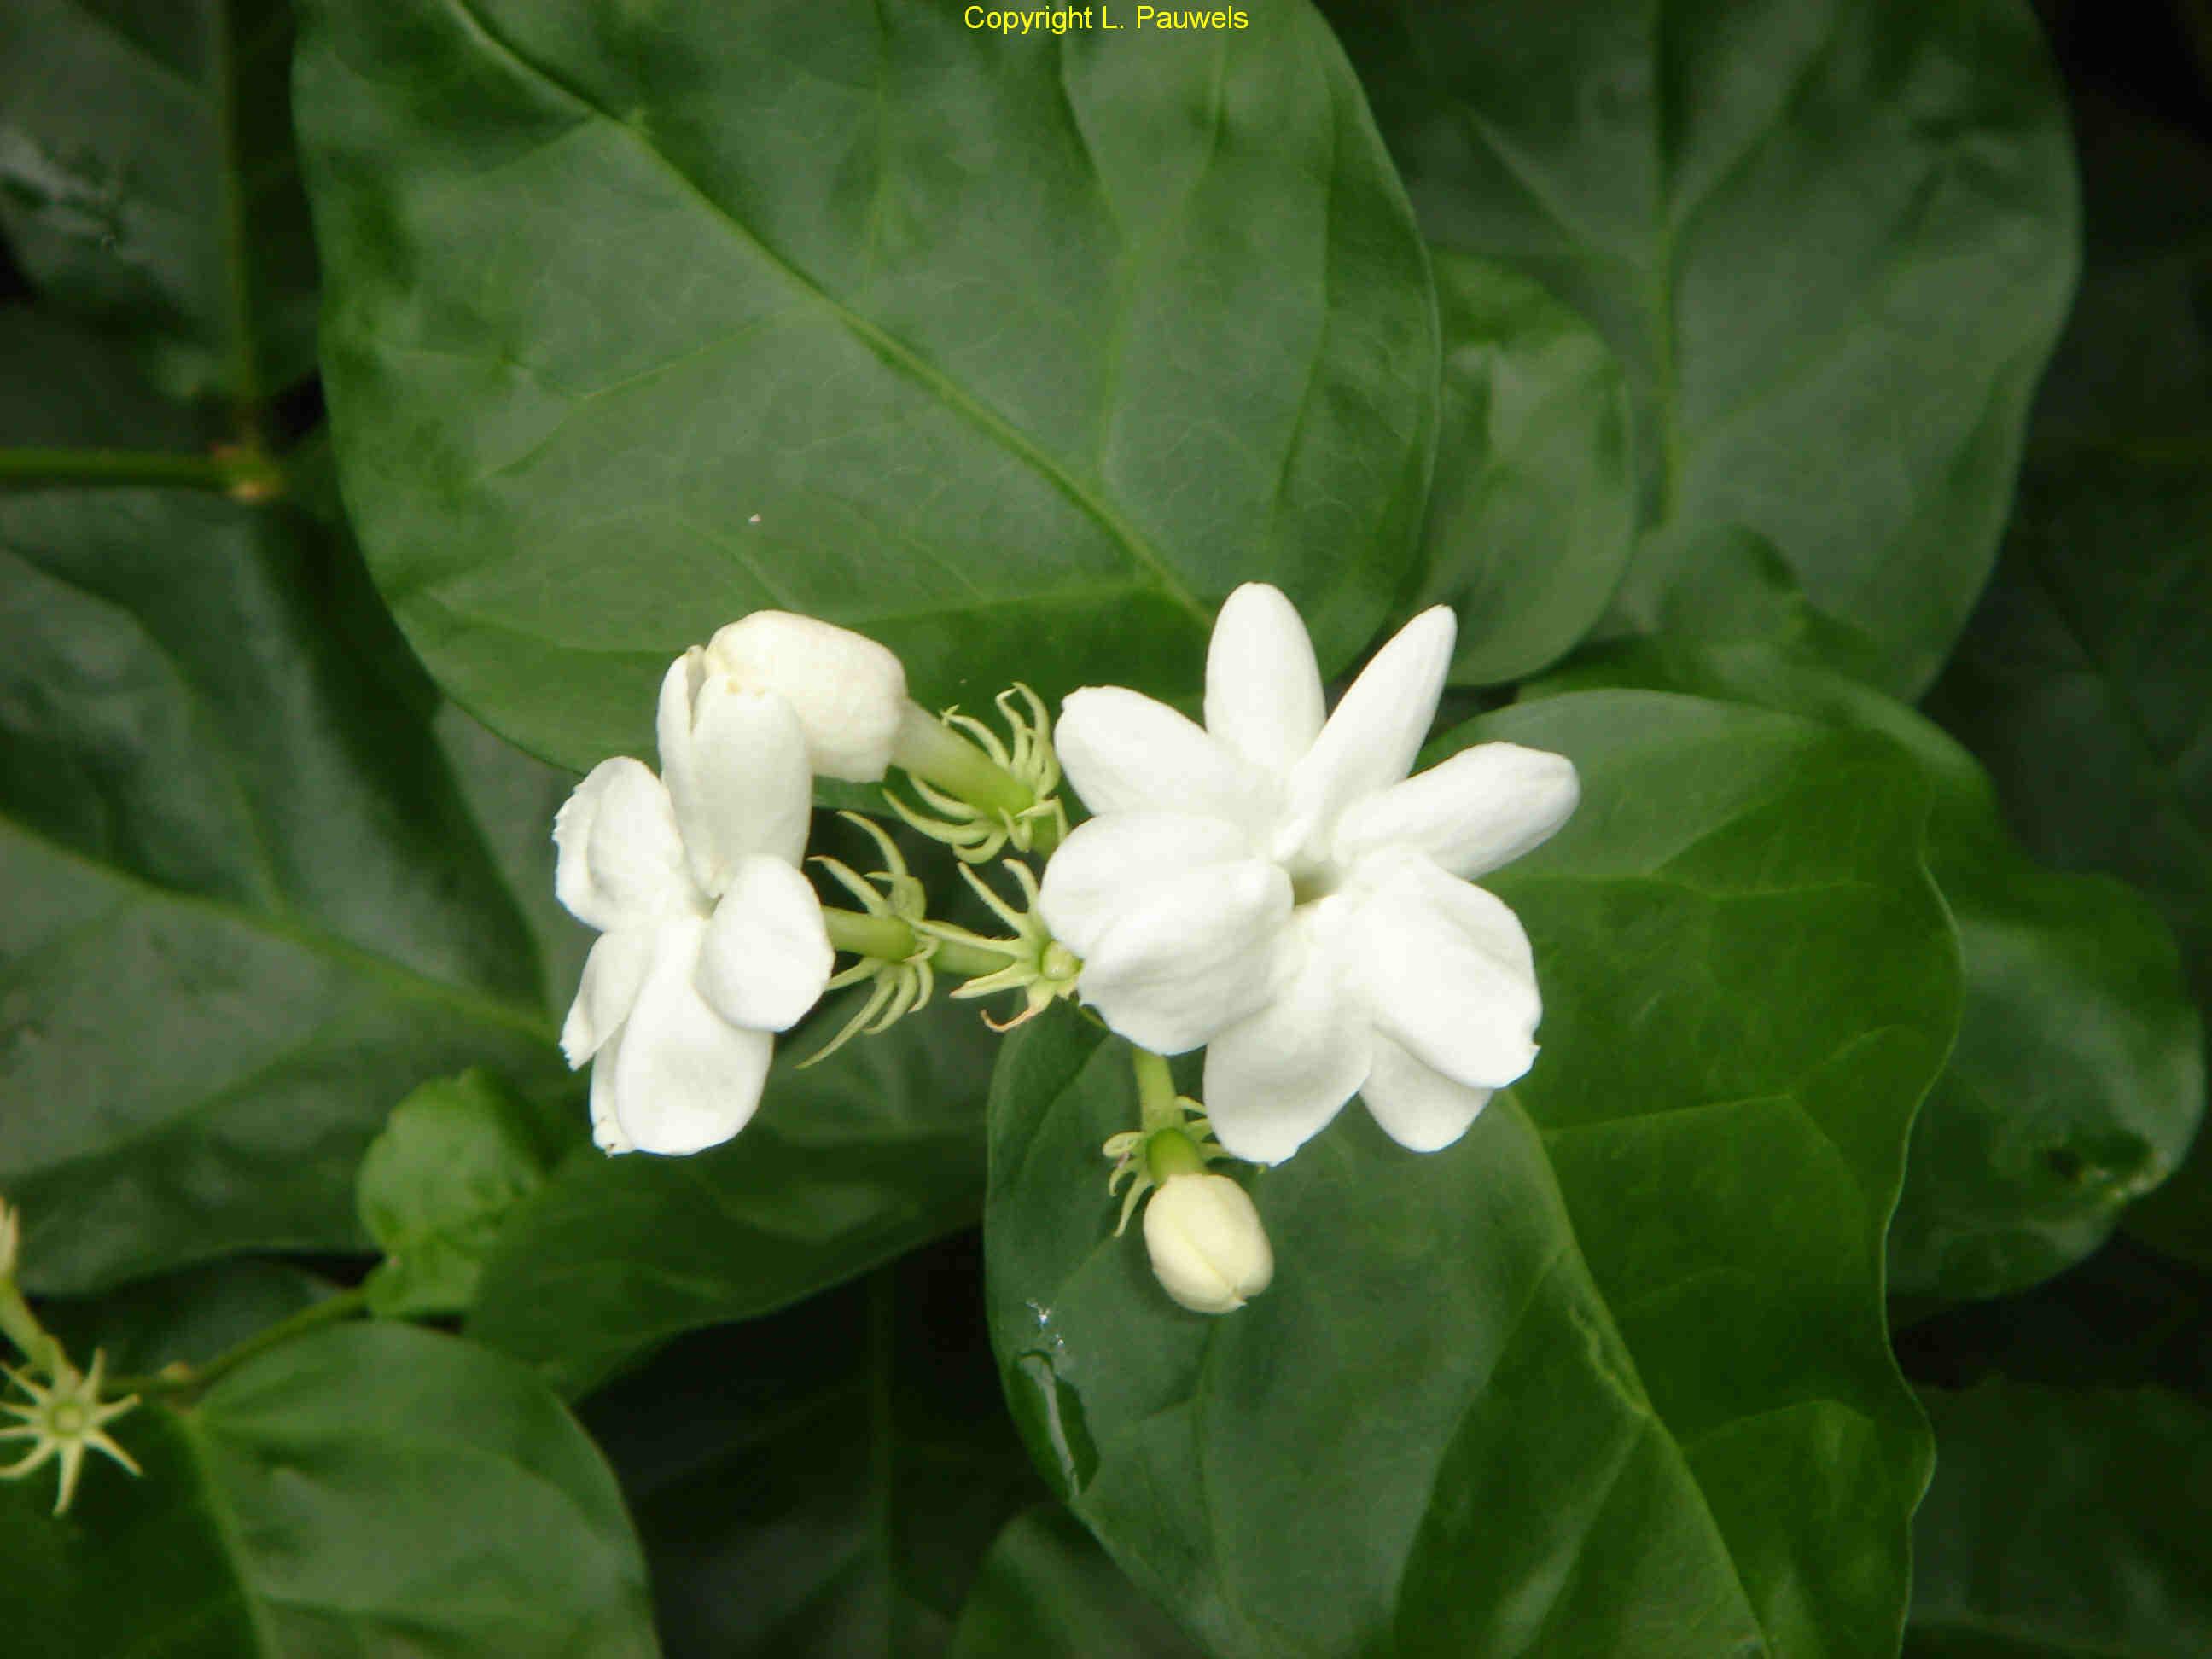 Horticulture Flower Crops Malligai